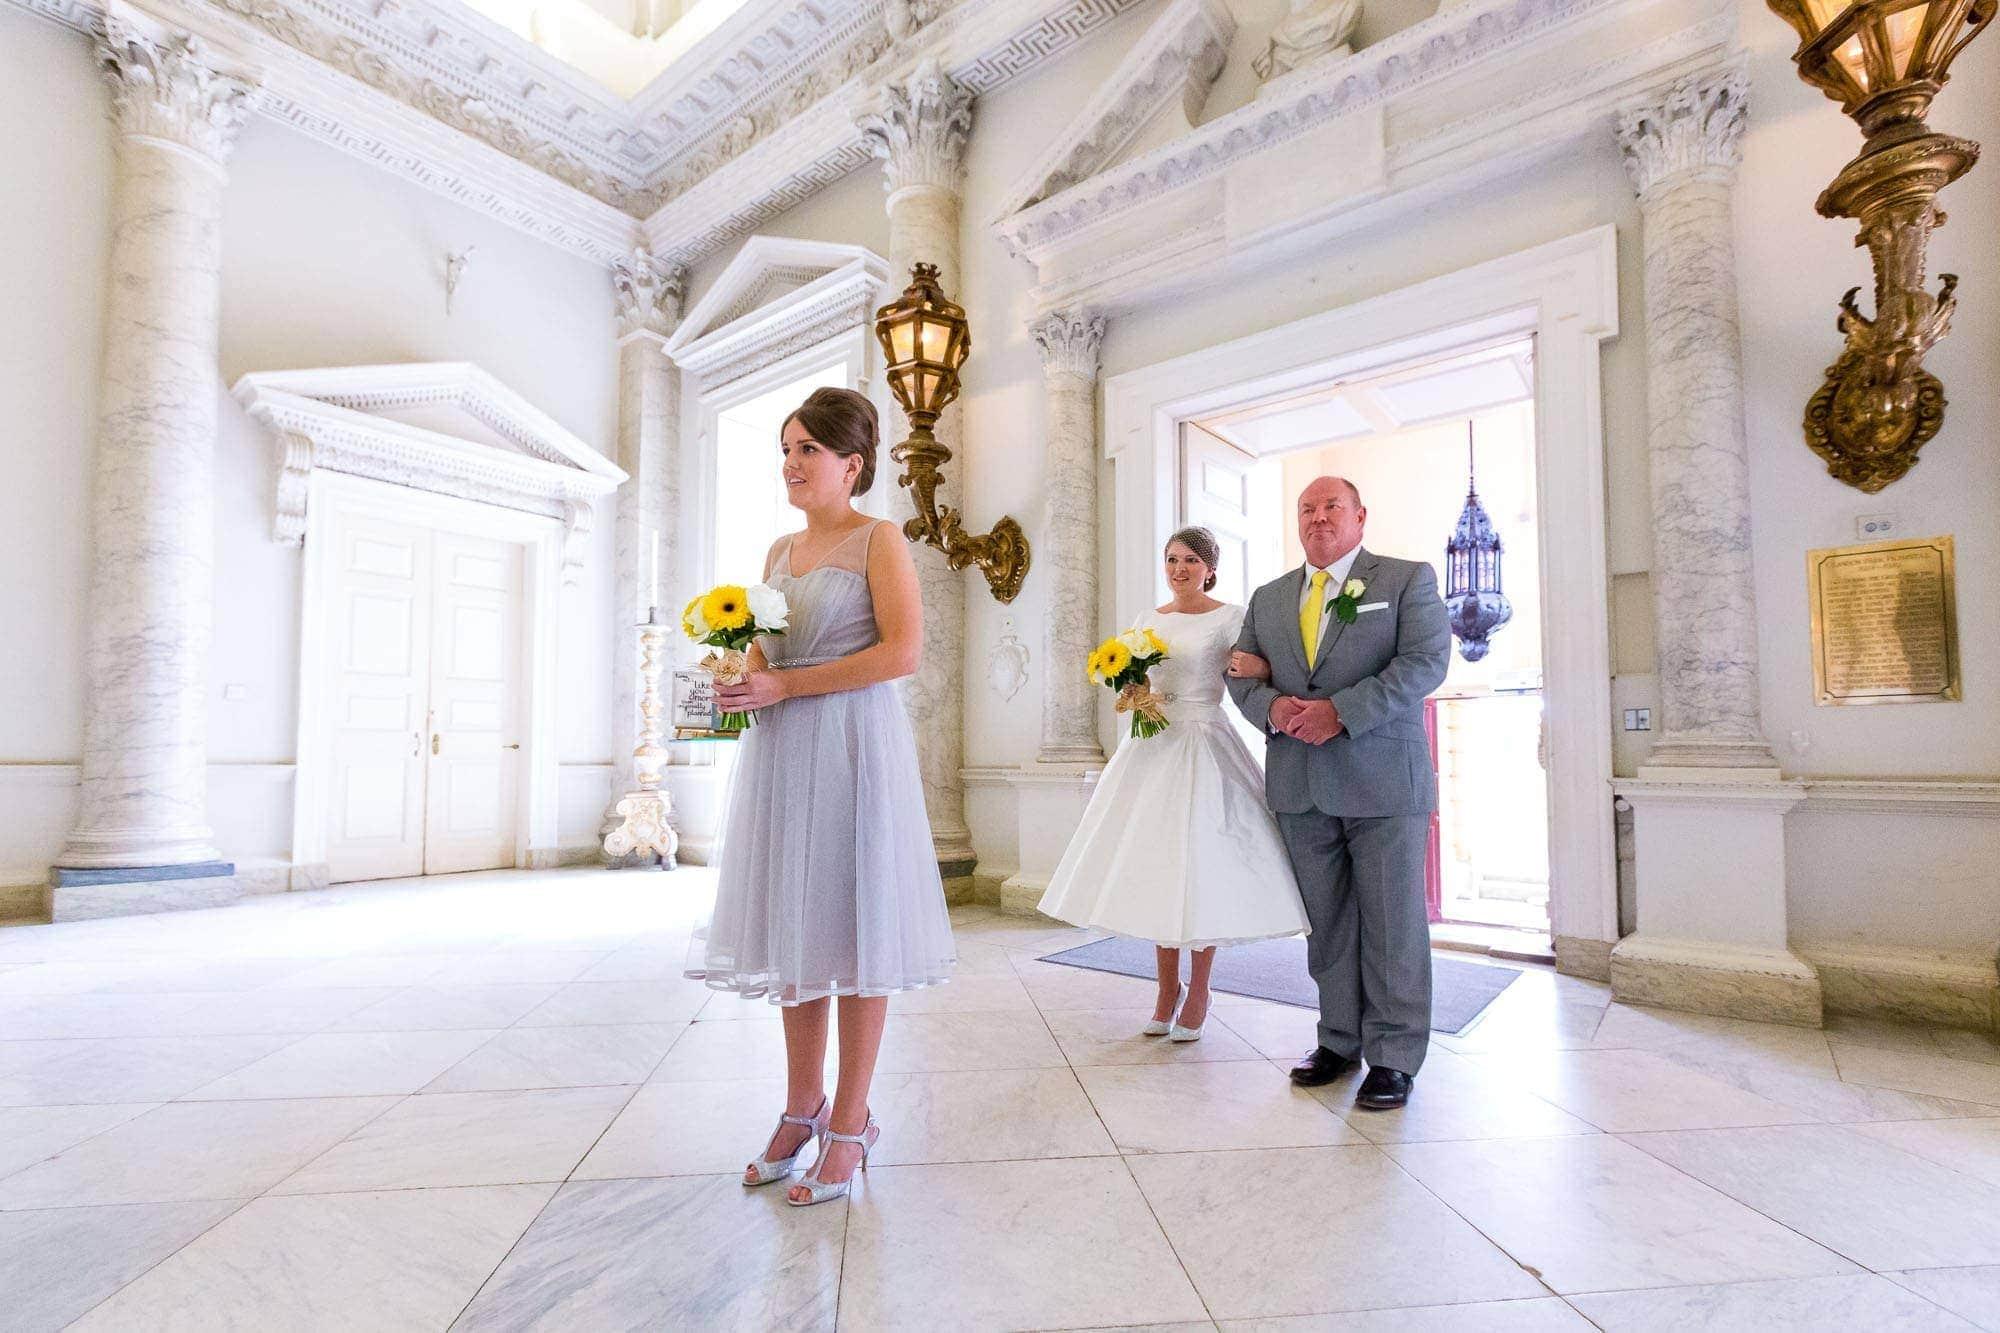 Clandon Park Wedding Photographer 40 4499